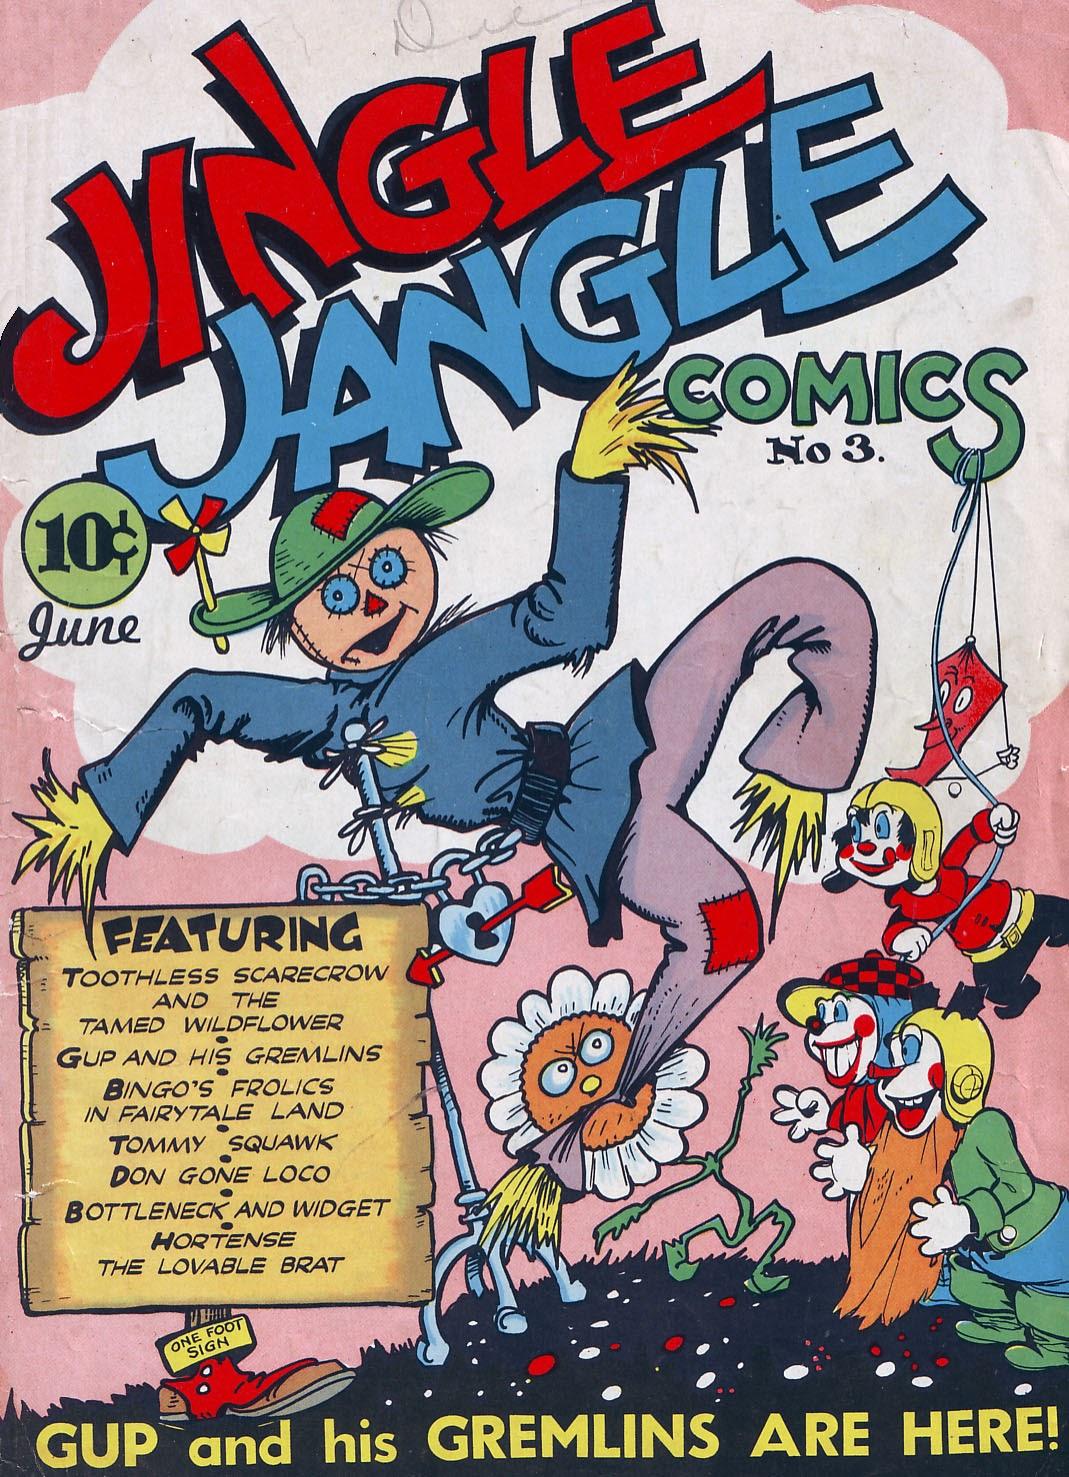 Jingle Jangle Comics 3 Page 1